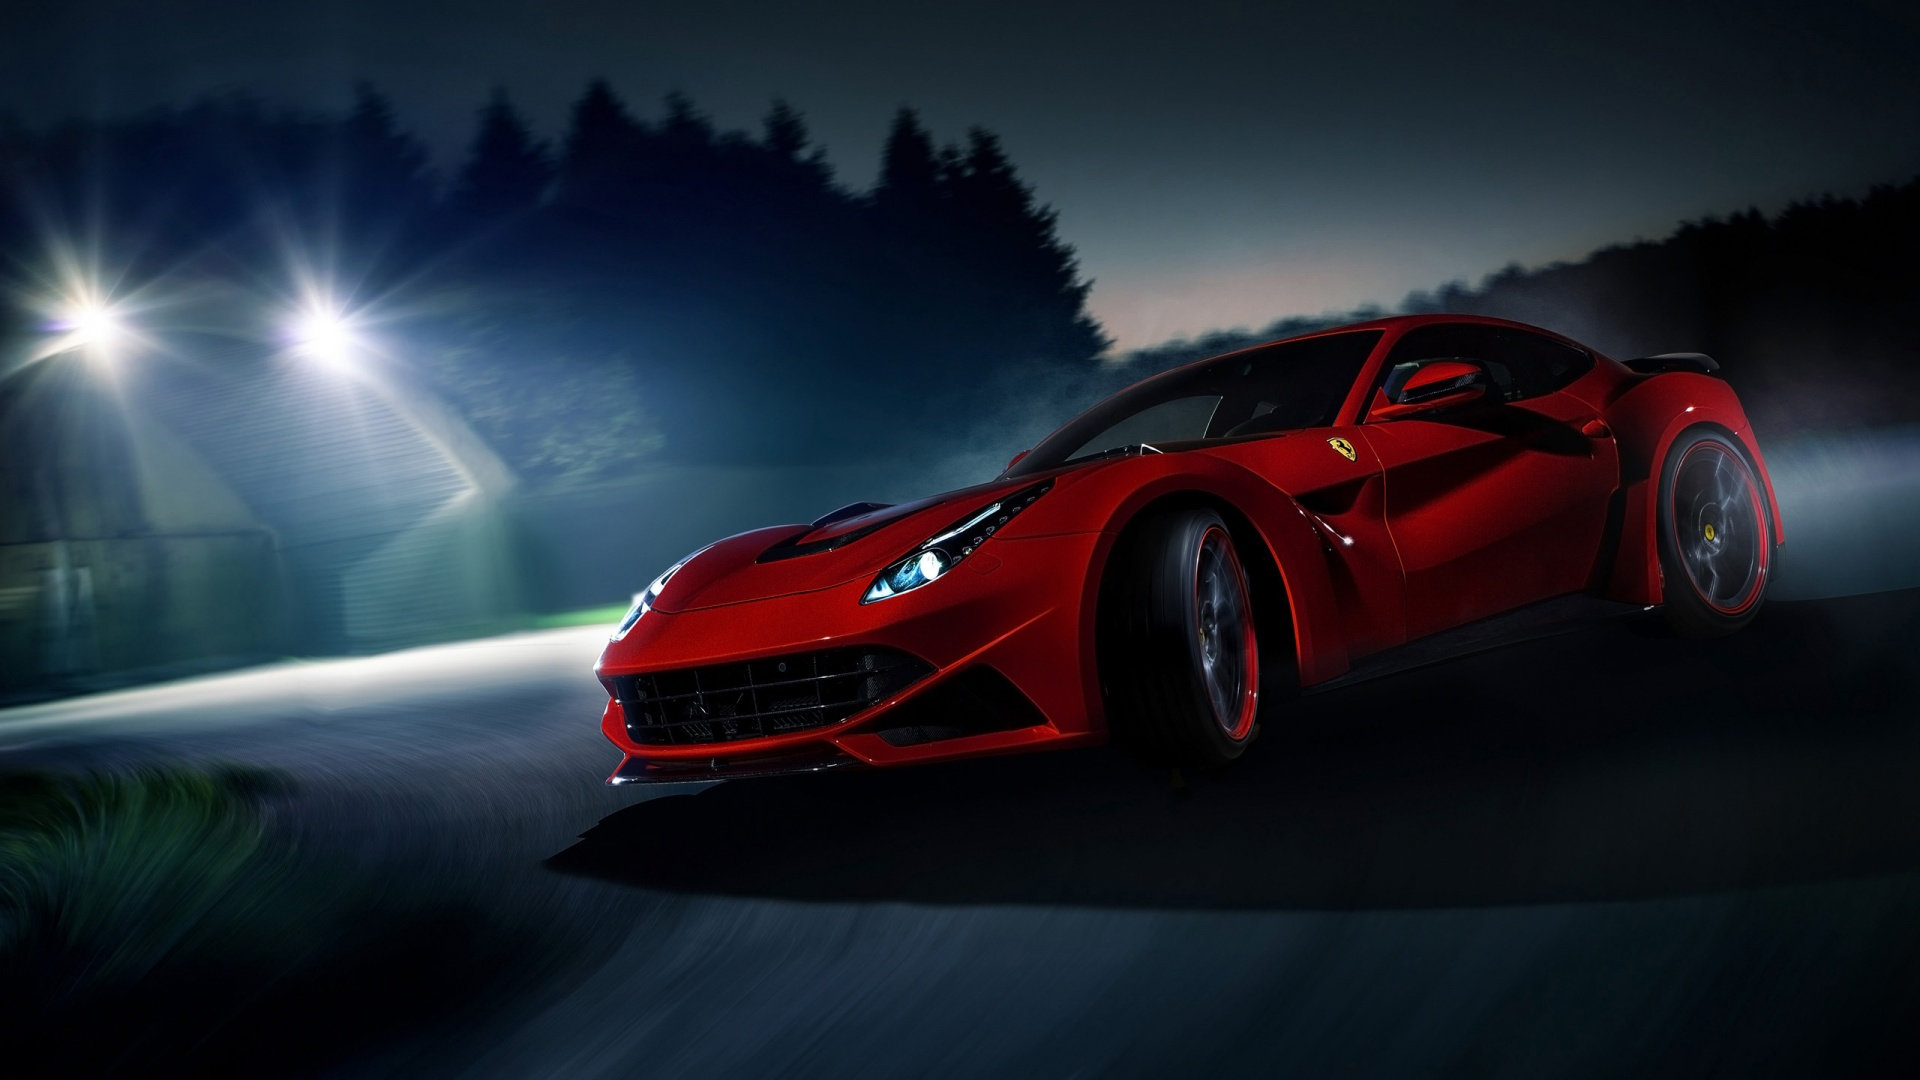 Lamborghini Sesto Elemento Wallpaper Hd Tablet Wallpaper Car Pixelstalk Net